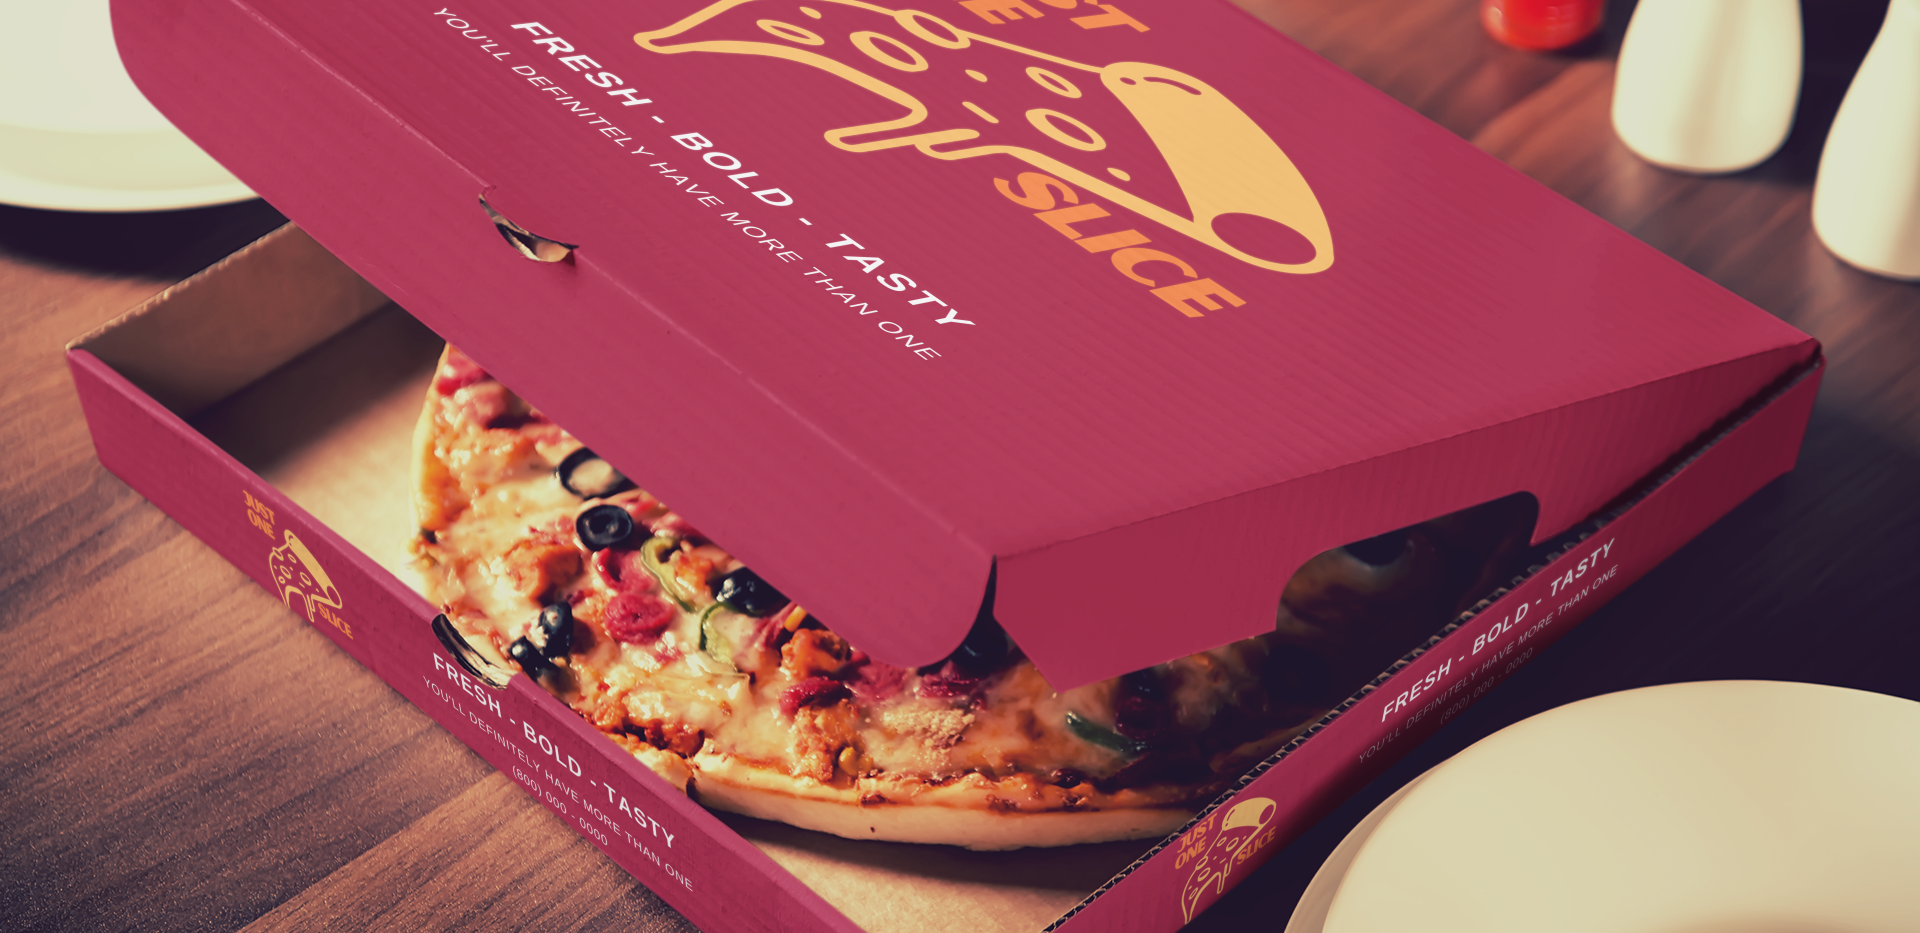 Just one Slice Pizza Box